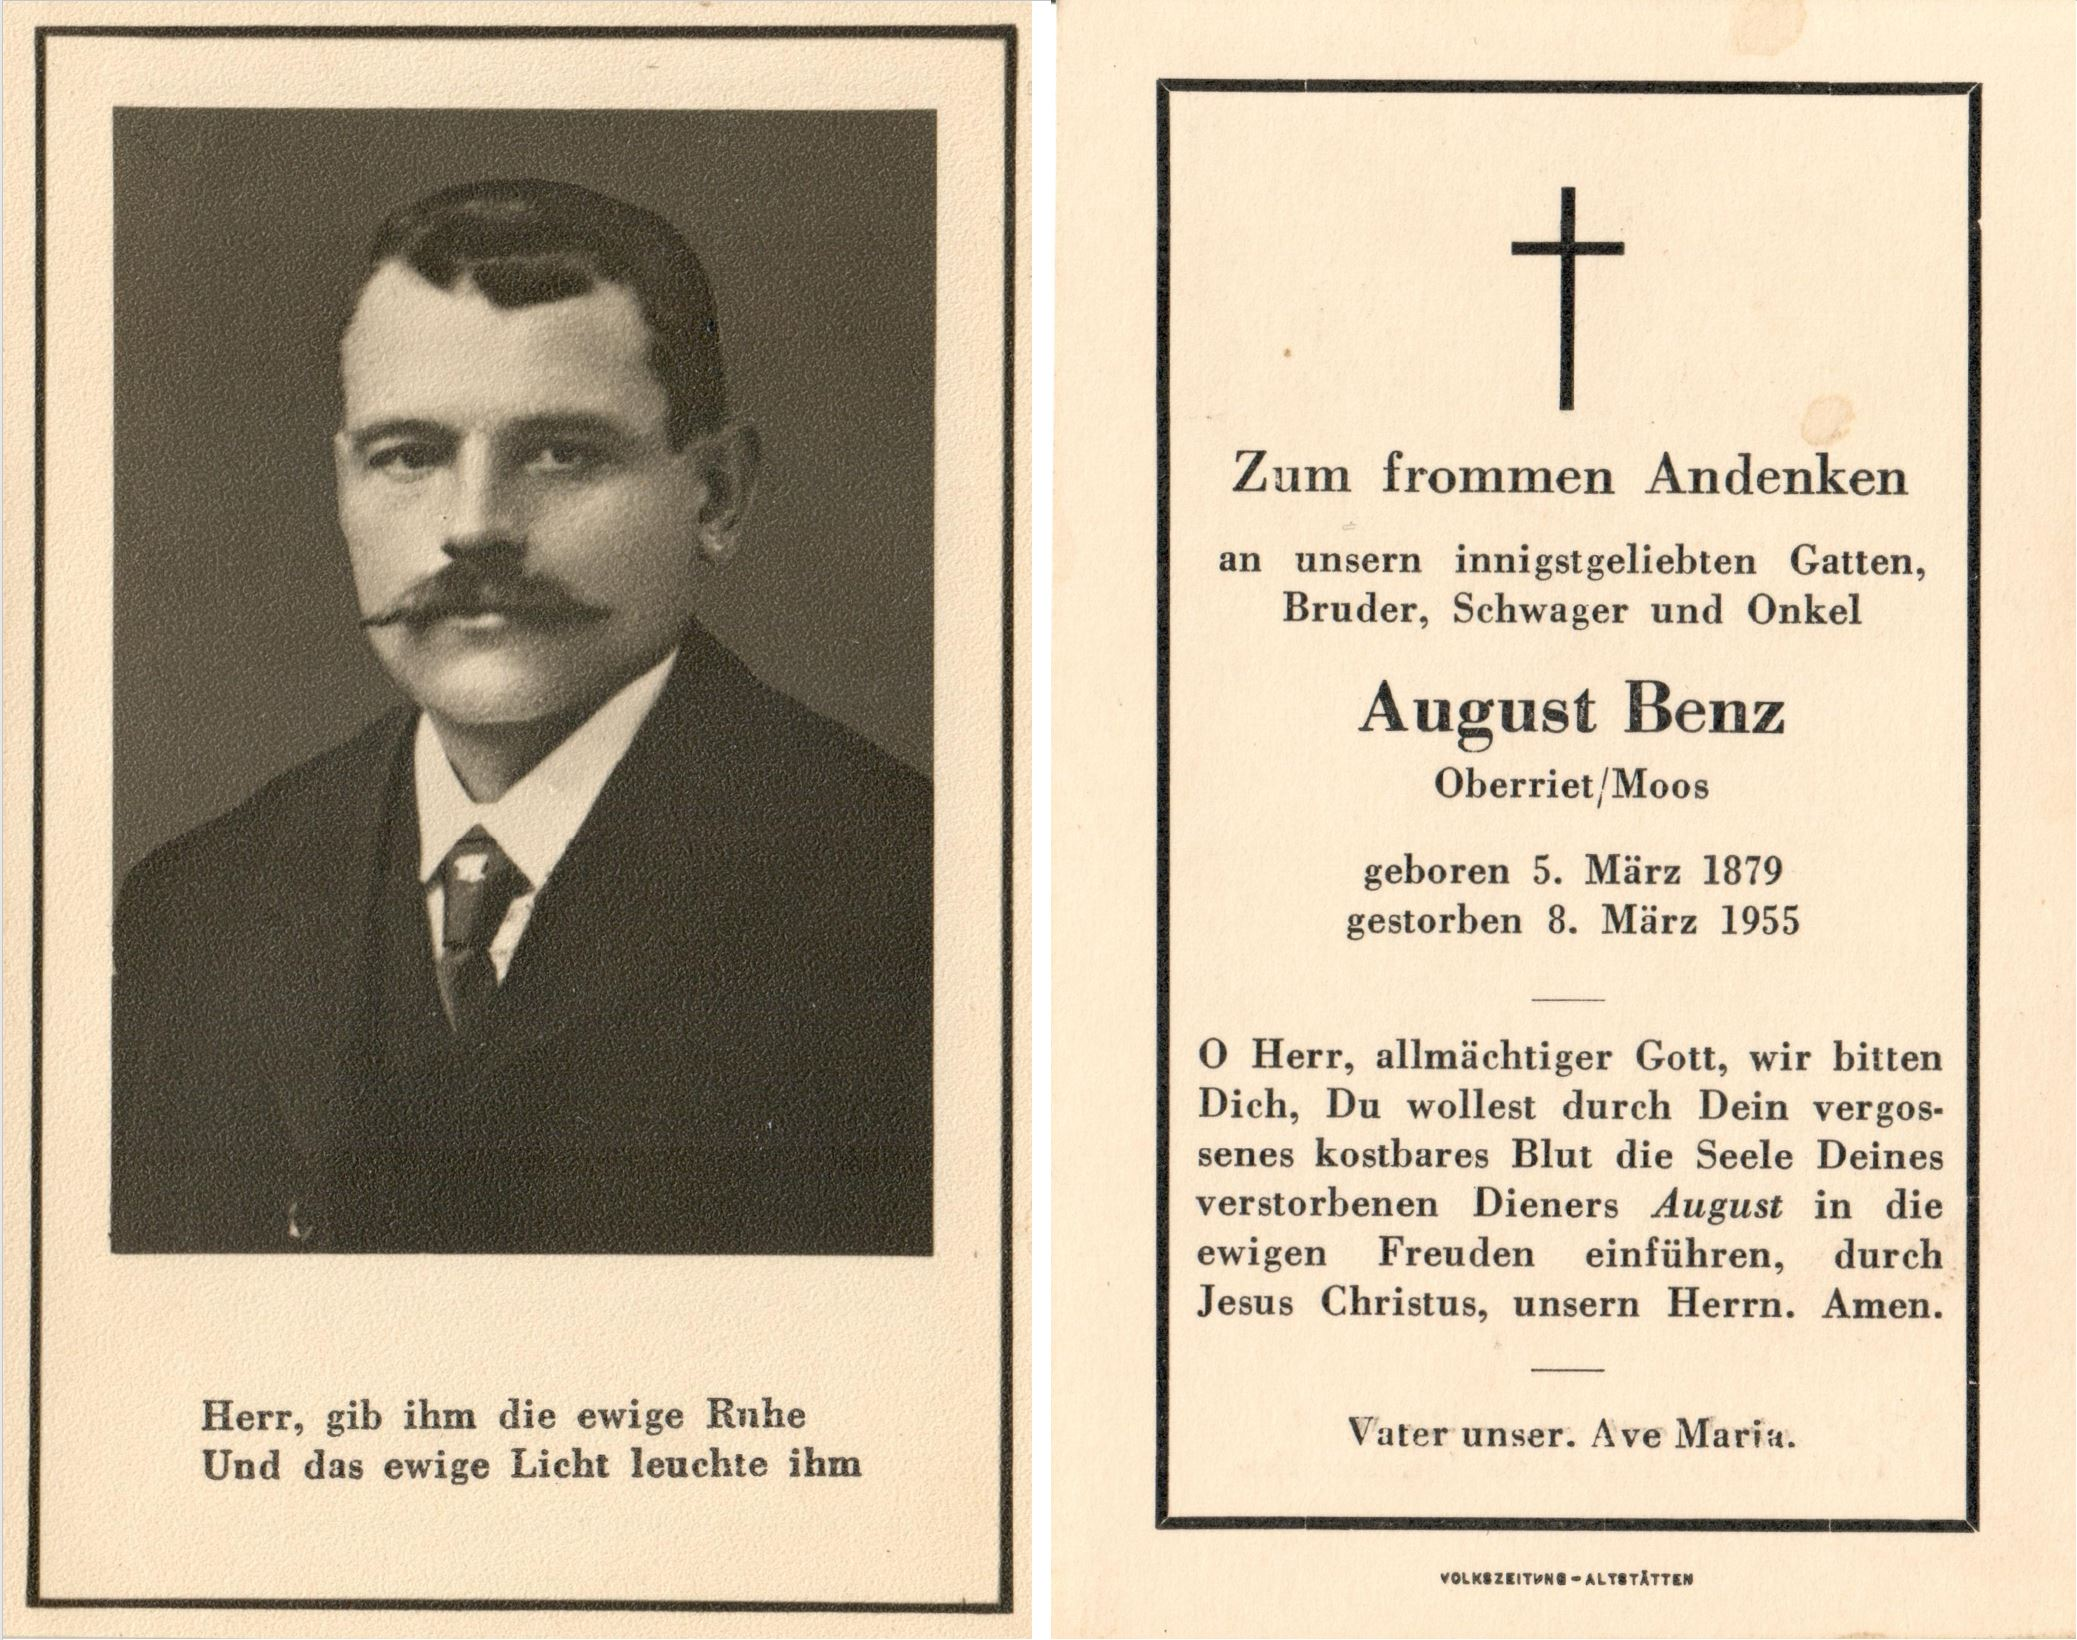 August Benz (1879-1955)